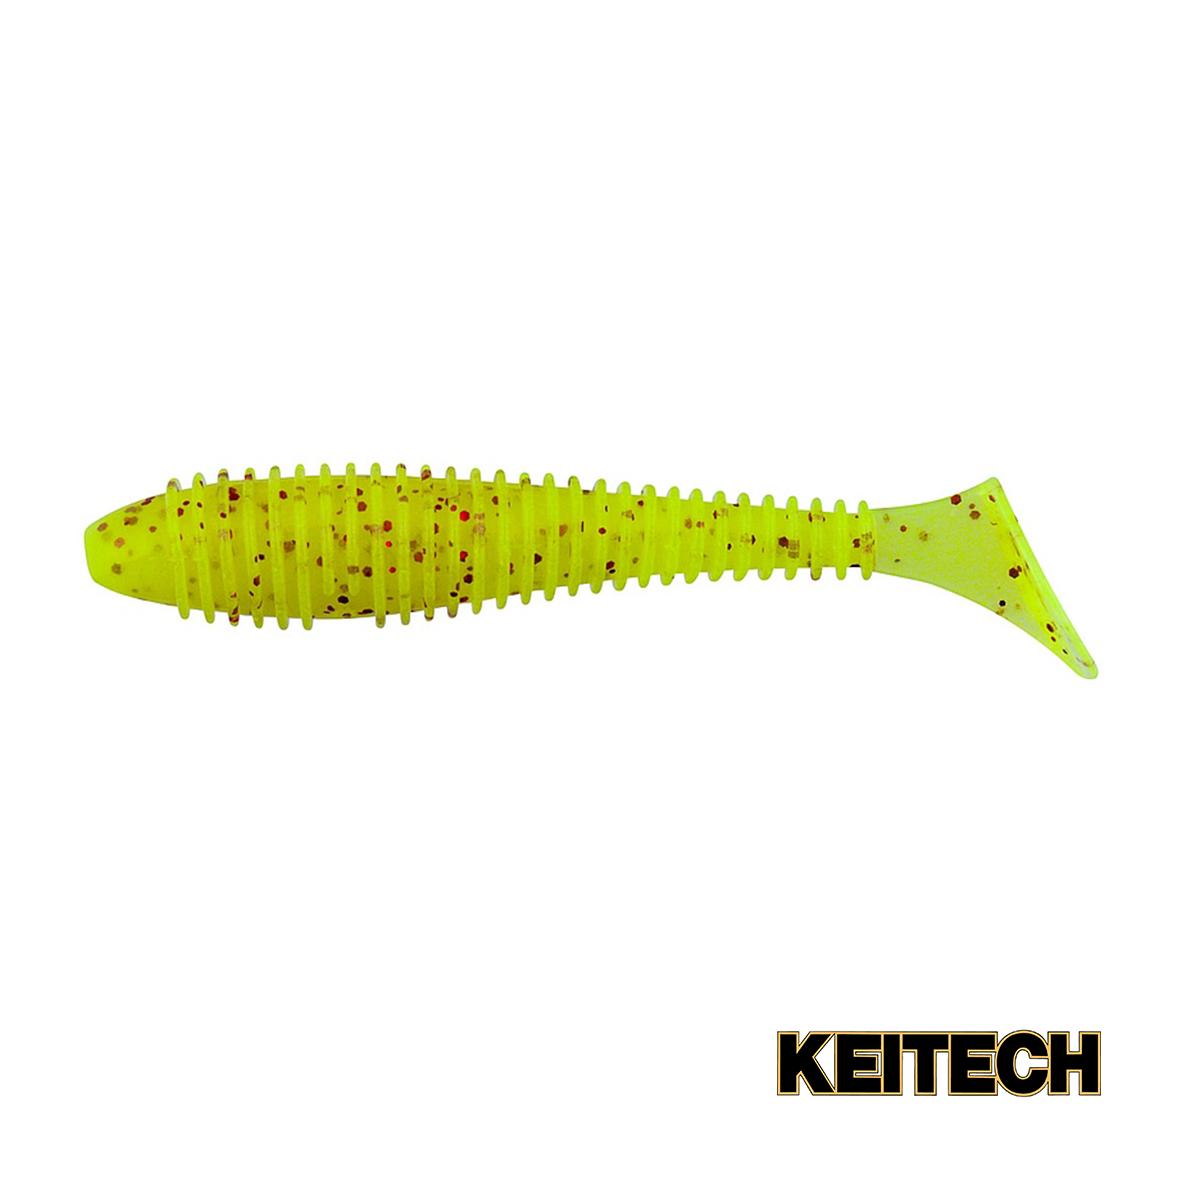 "Силикон Keitech Swing Impact FAT 3.8"" (6 шт/упак) ц:pal#01 chartr"